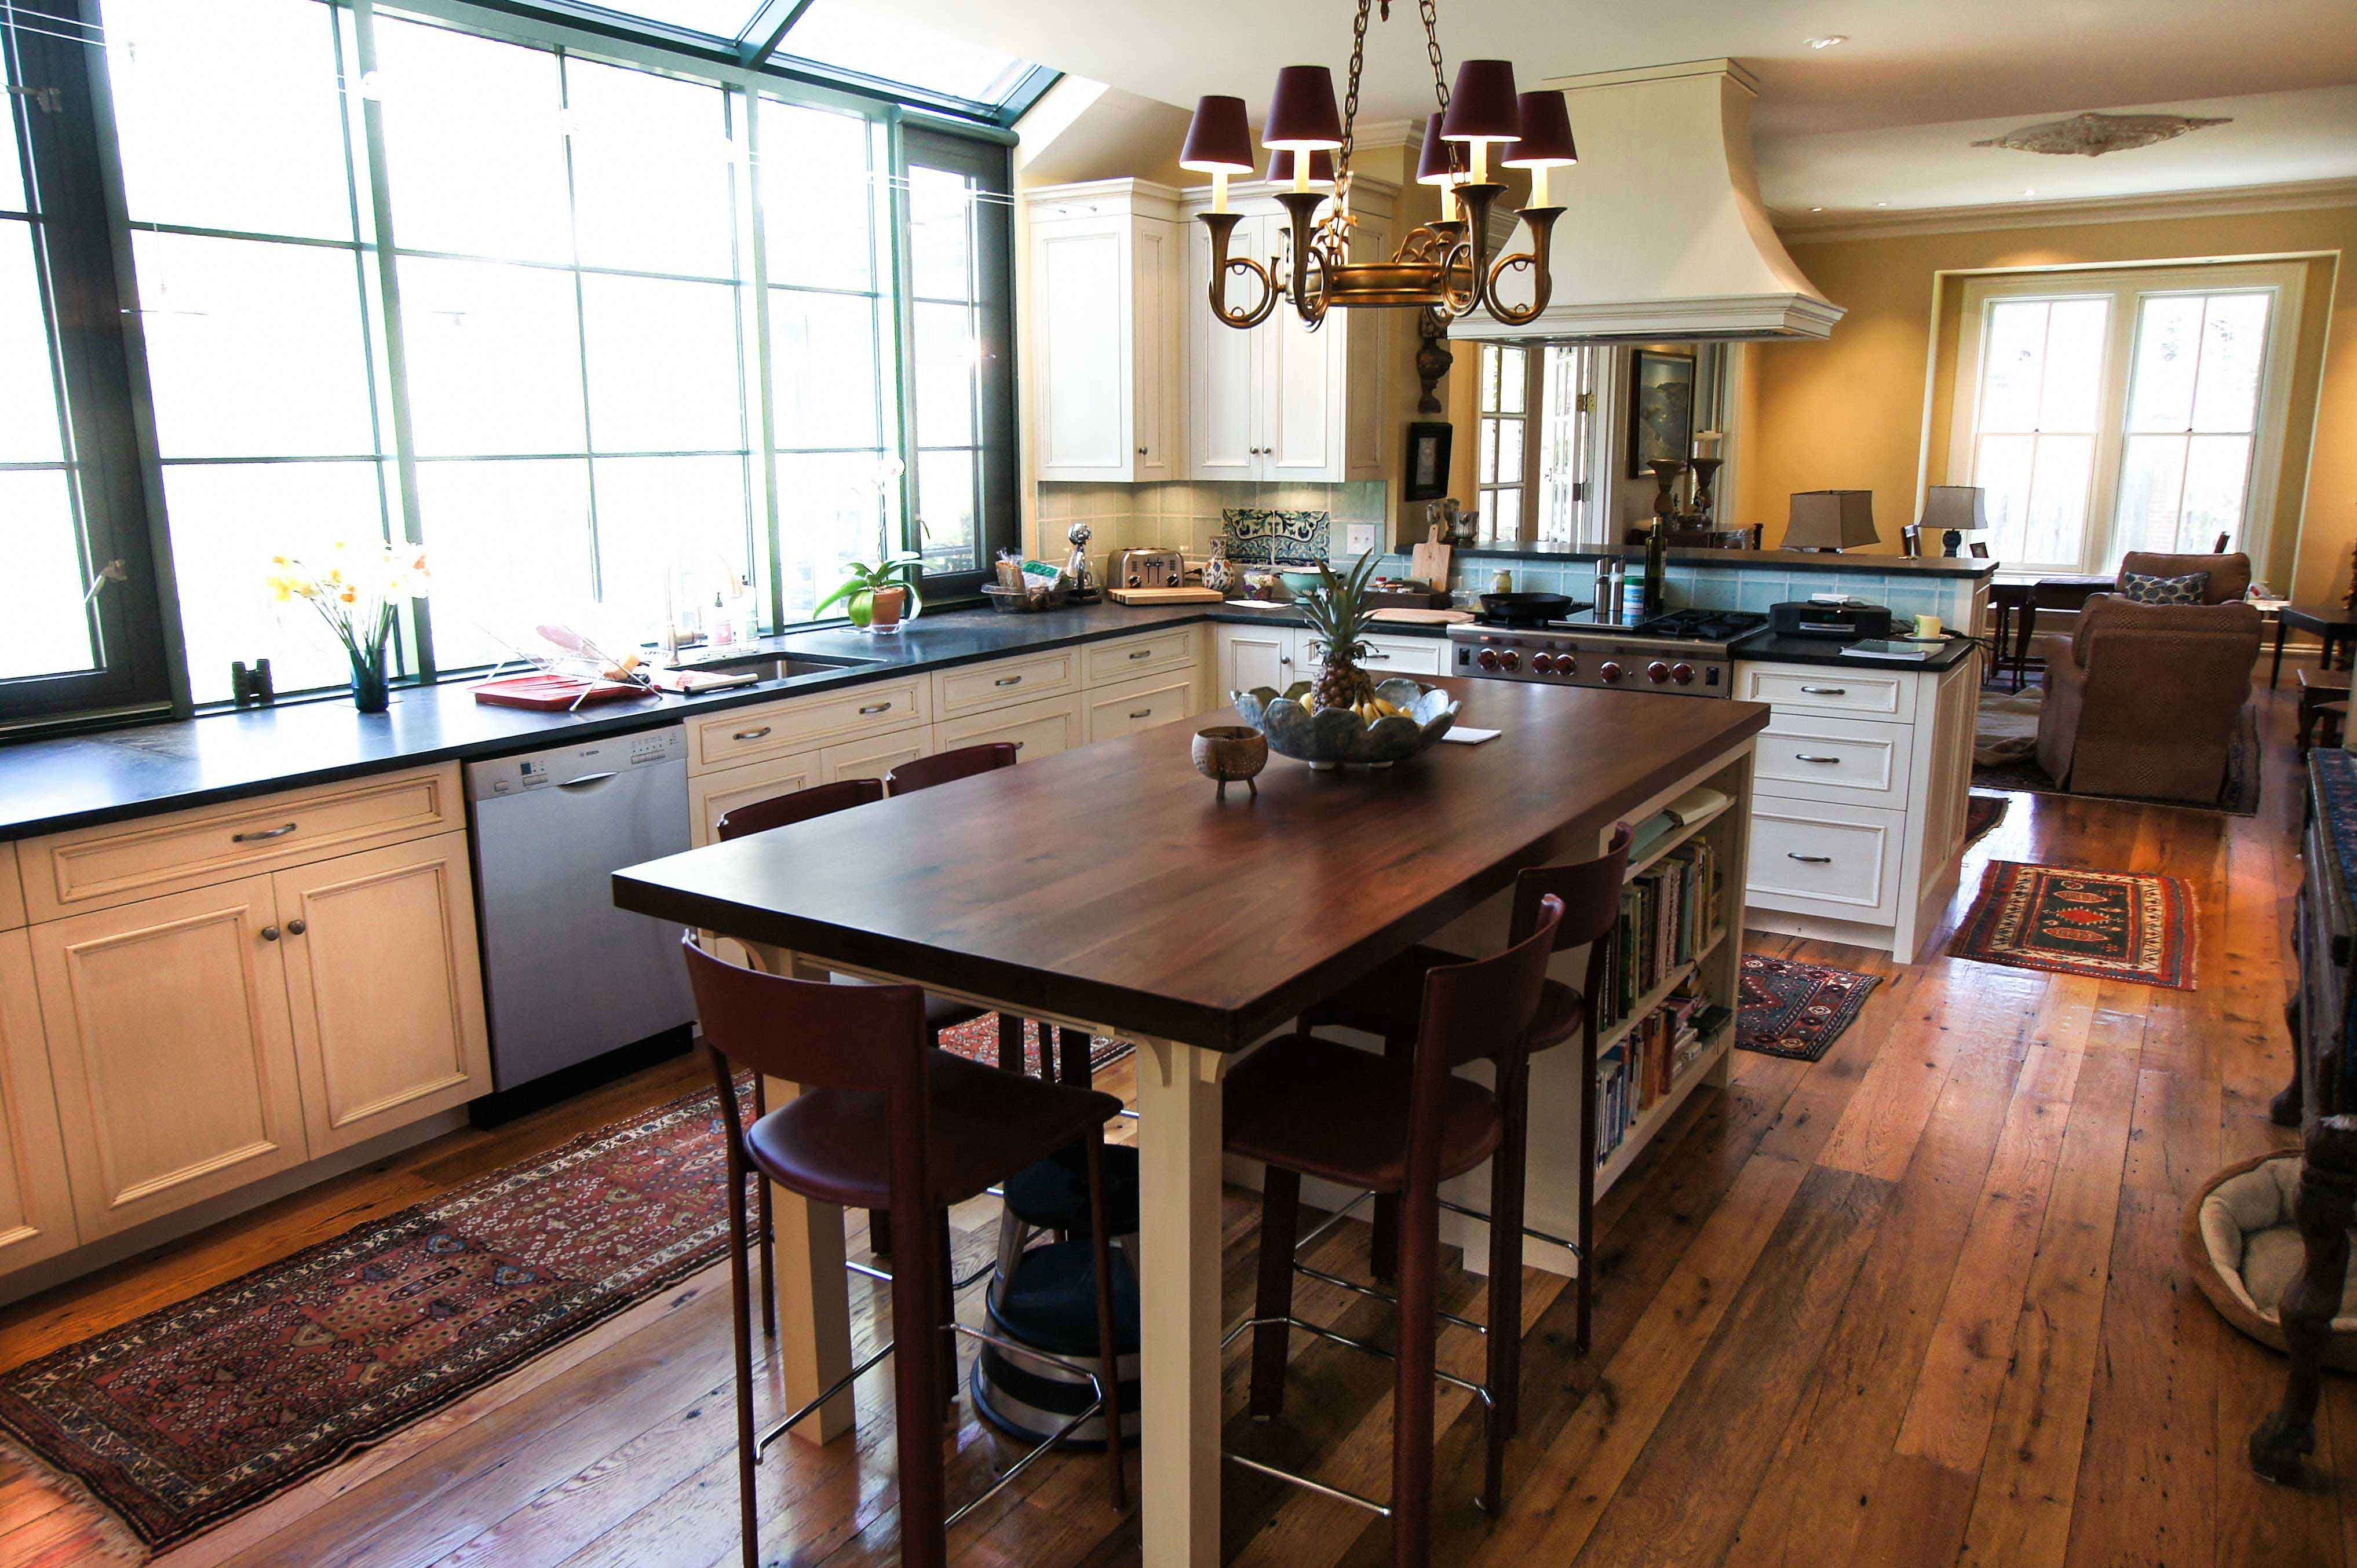 Reclaimed White Oak Flooring Kitchen Jpg 4 068 2 707 Pixels Custom Kitchen Island Kitchen Island And Table Combo Kitchen Island Dining Table